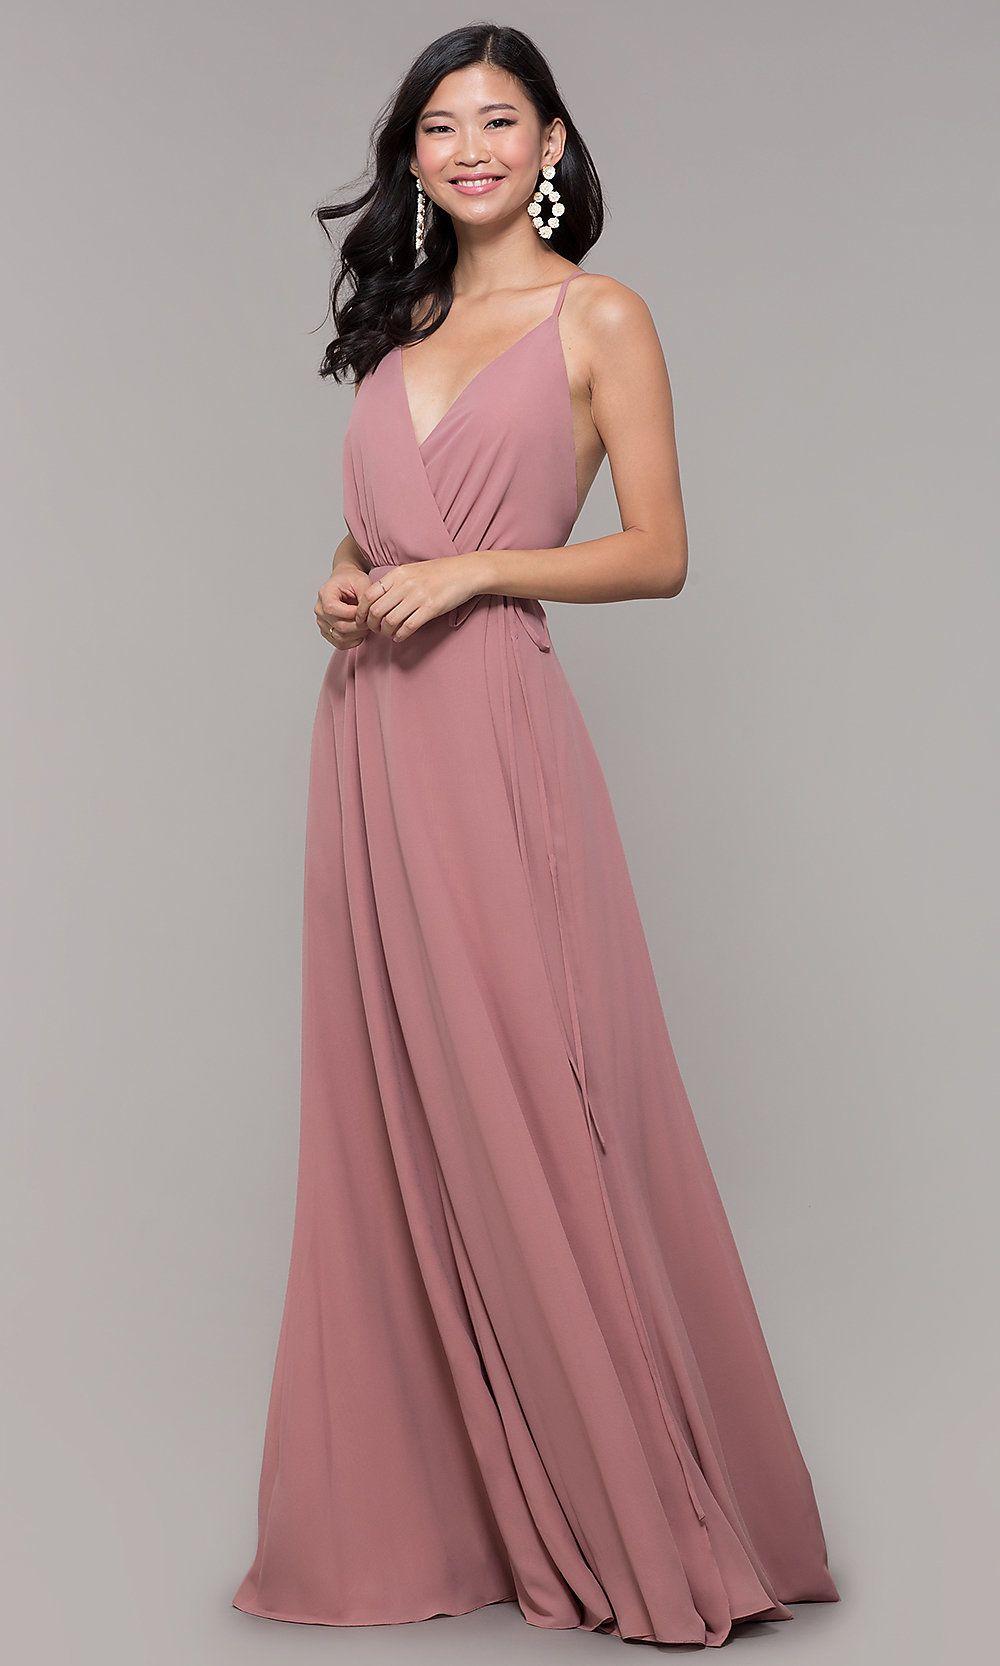 a3e8411547c4b Long Formal V-Neck Wrap Prom Dress in 2019